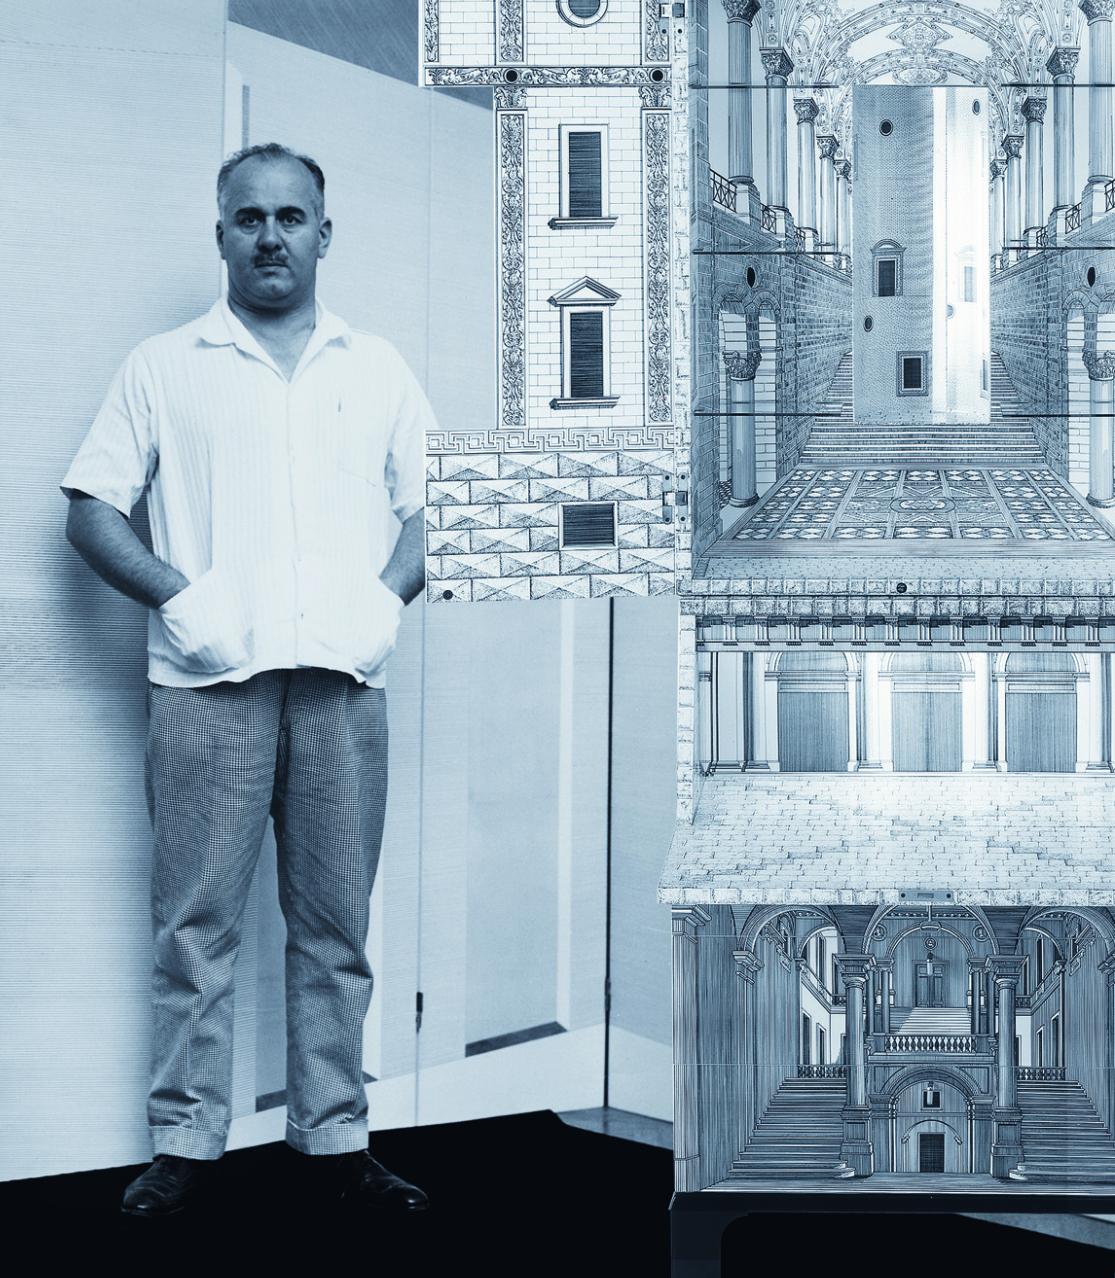 Piero Fornasetti with The 'Architettura' Trumeau-bar